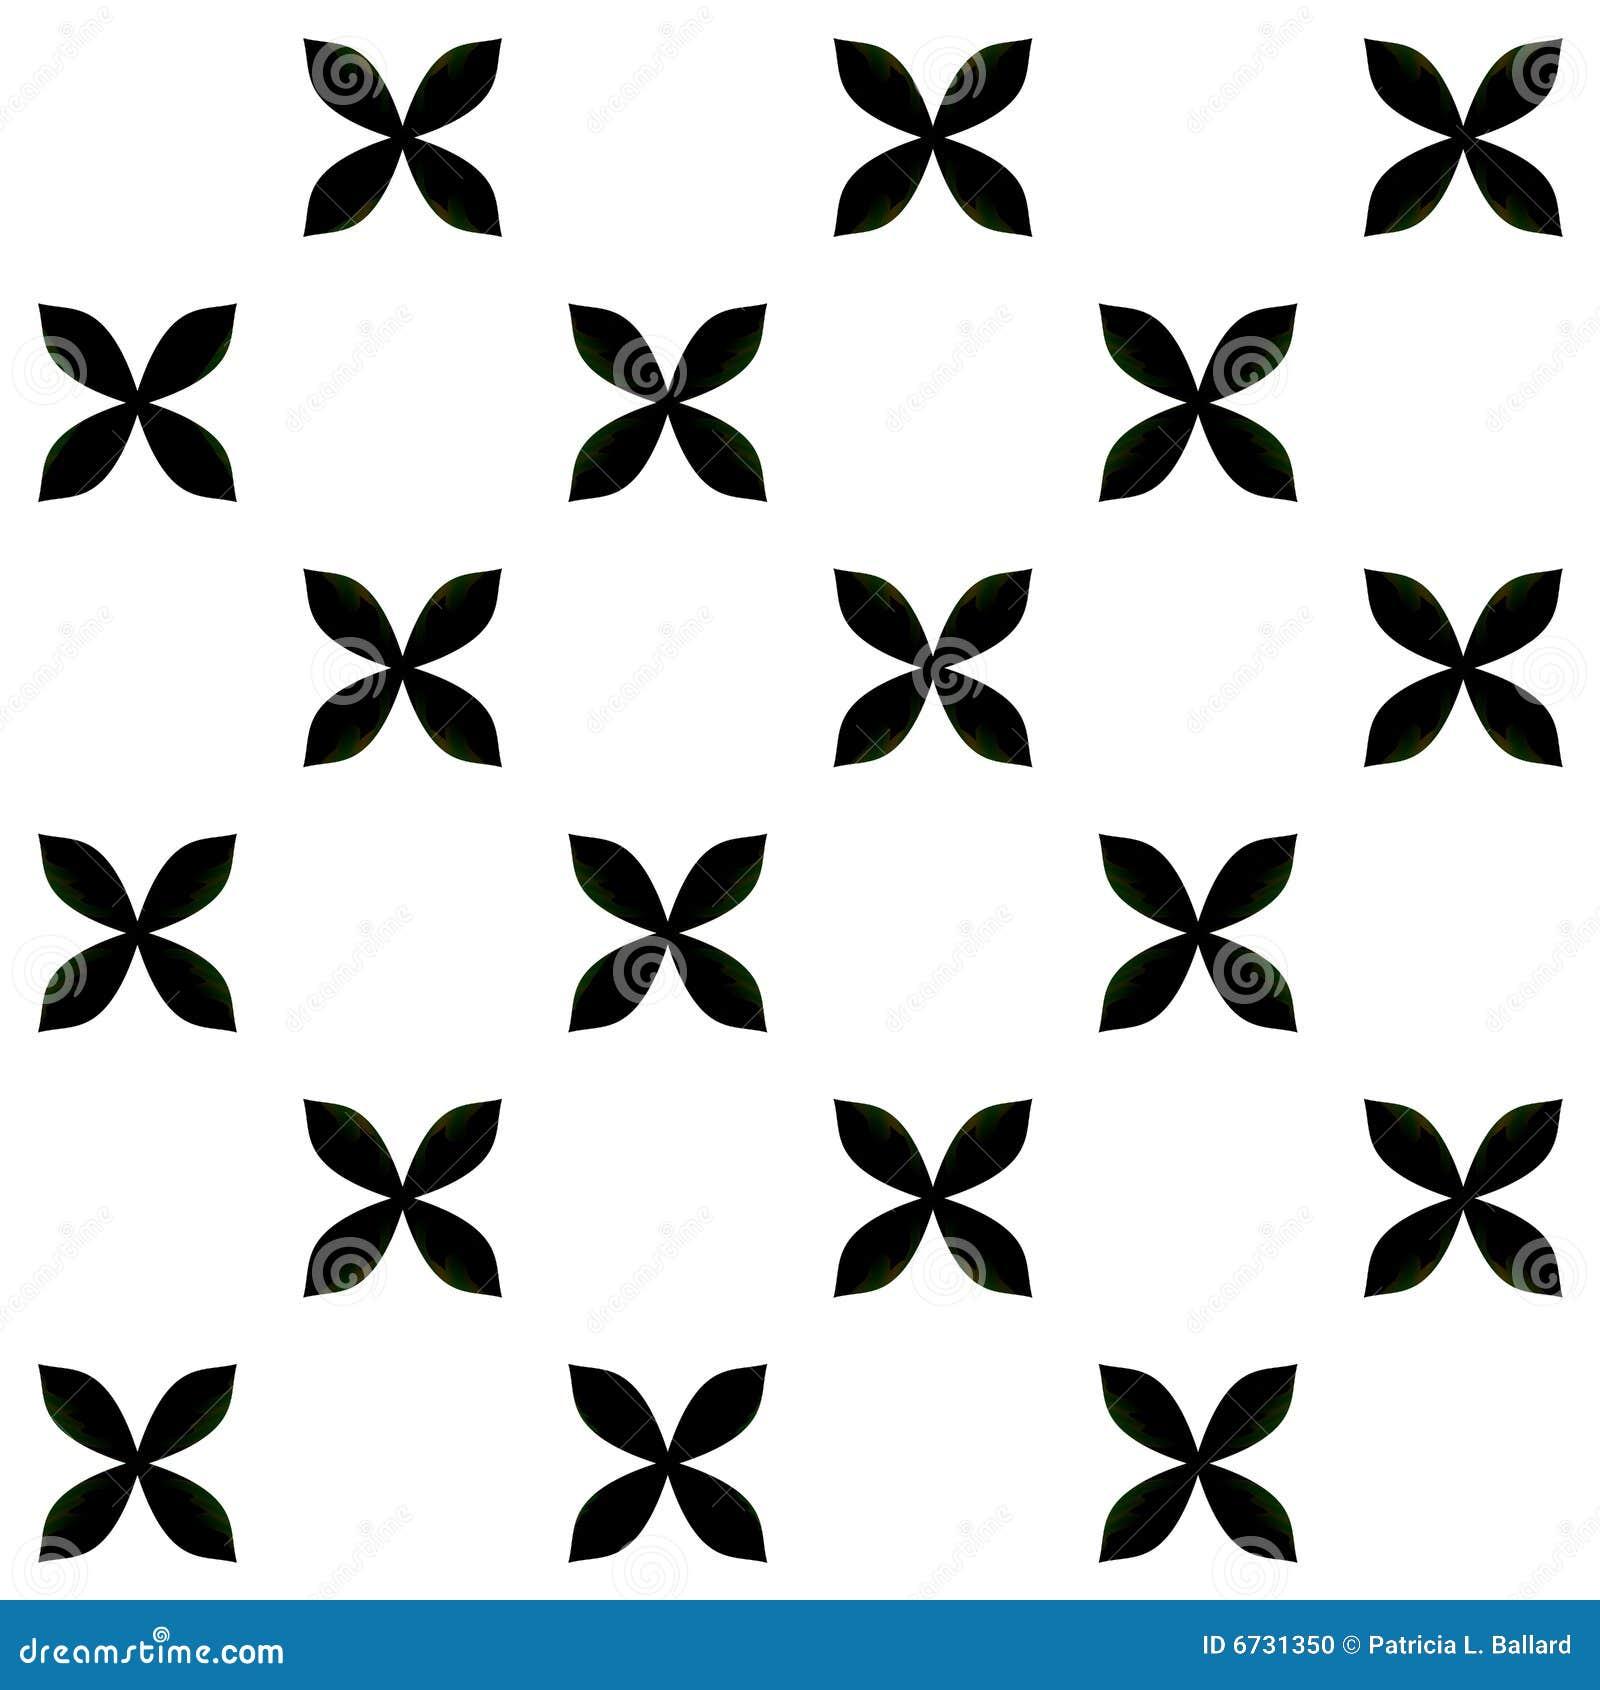 Simple floral designs patterns